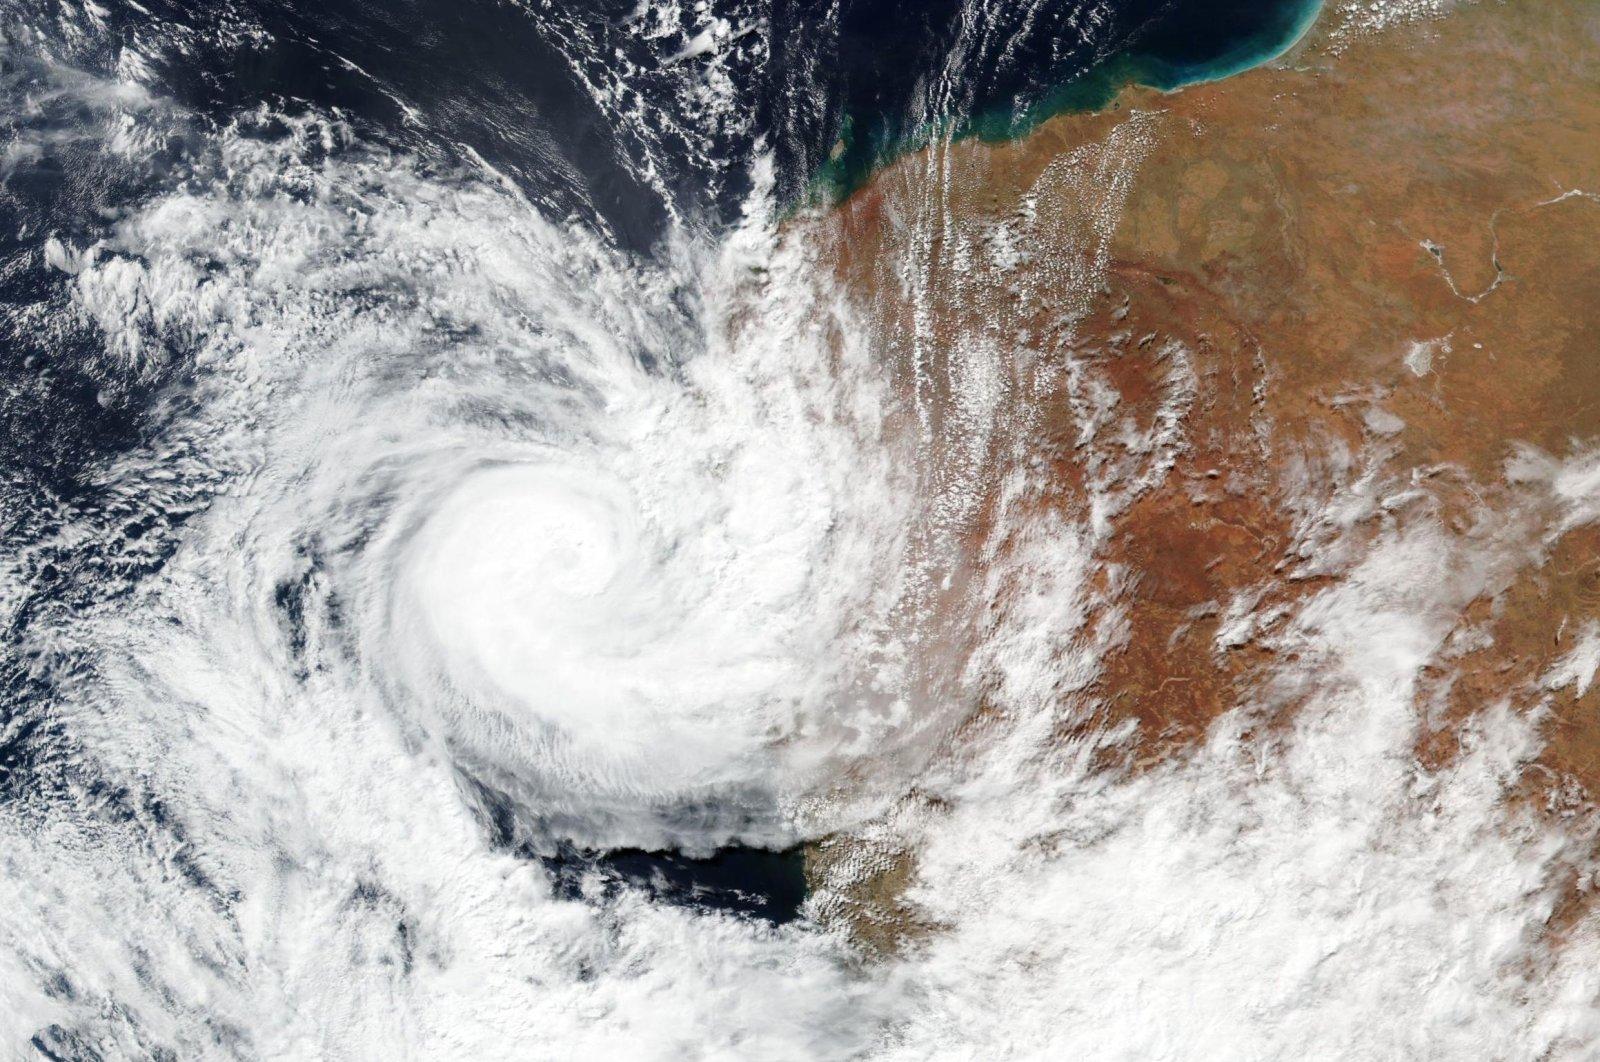 A satellite image shows Tropical Cyclone Seroja hitting the coast of Western Australia, April 11, 2021. (NASA via AP)